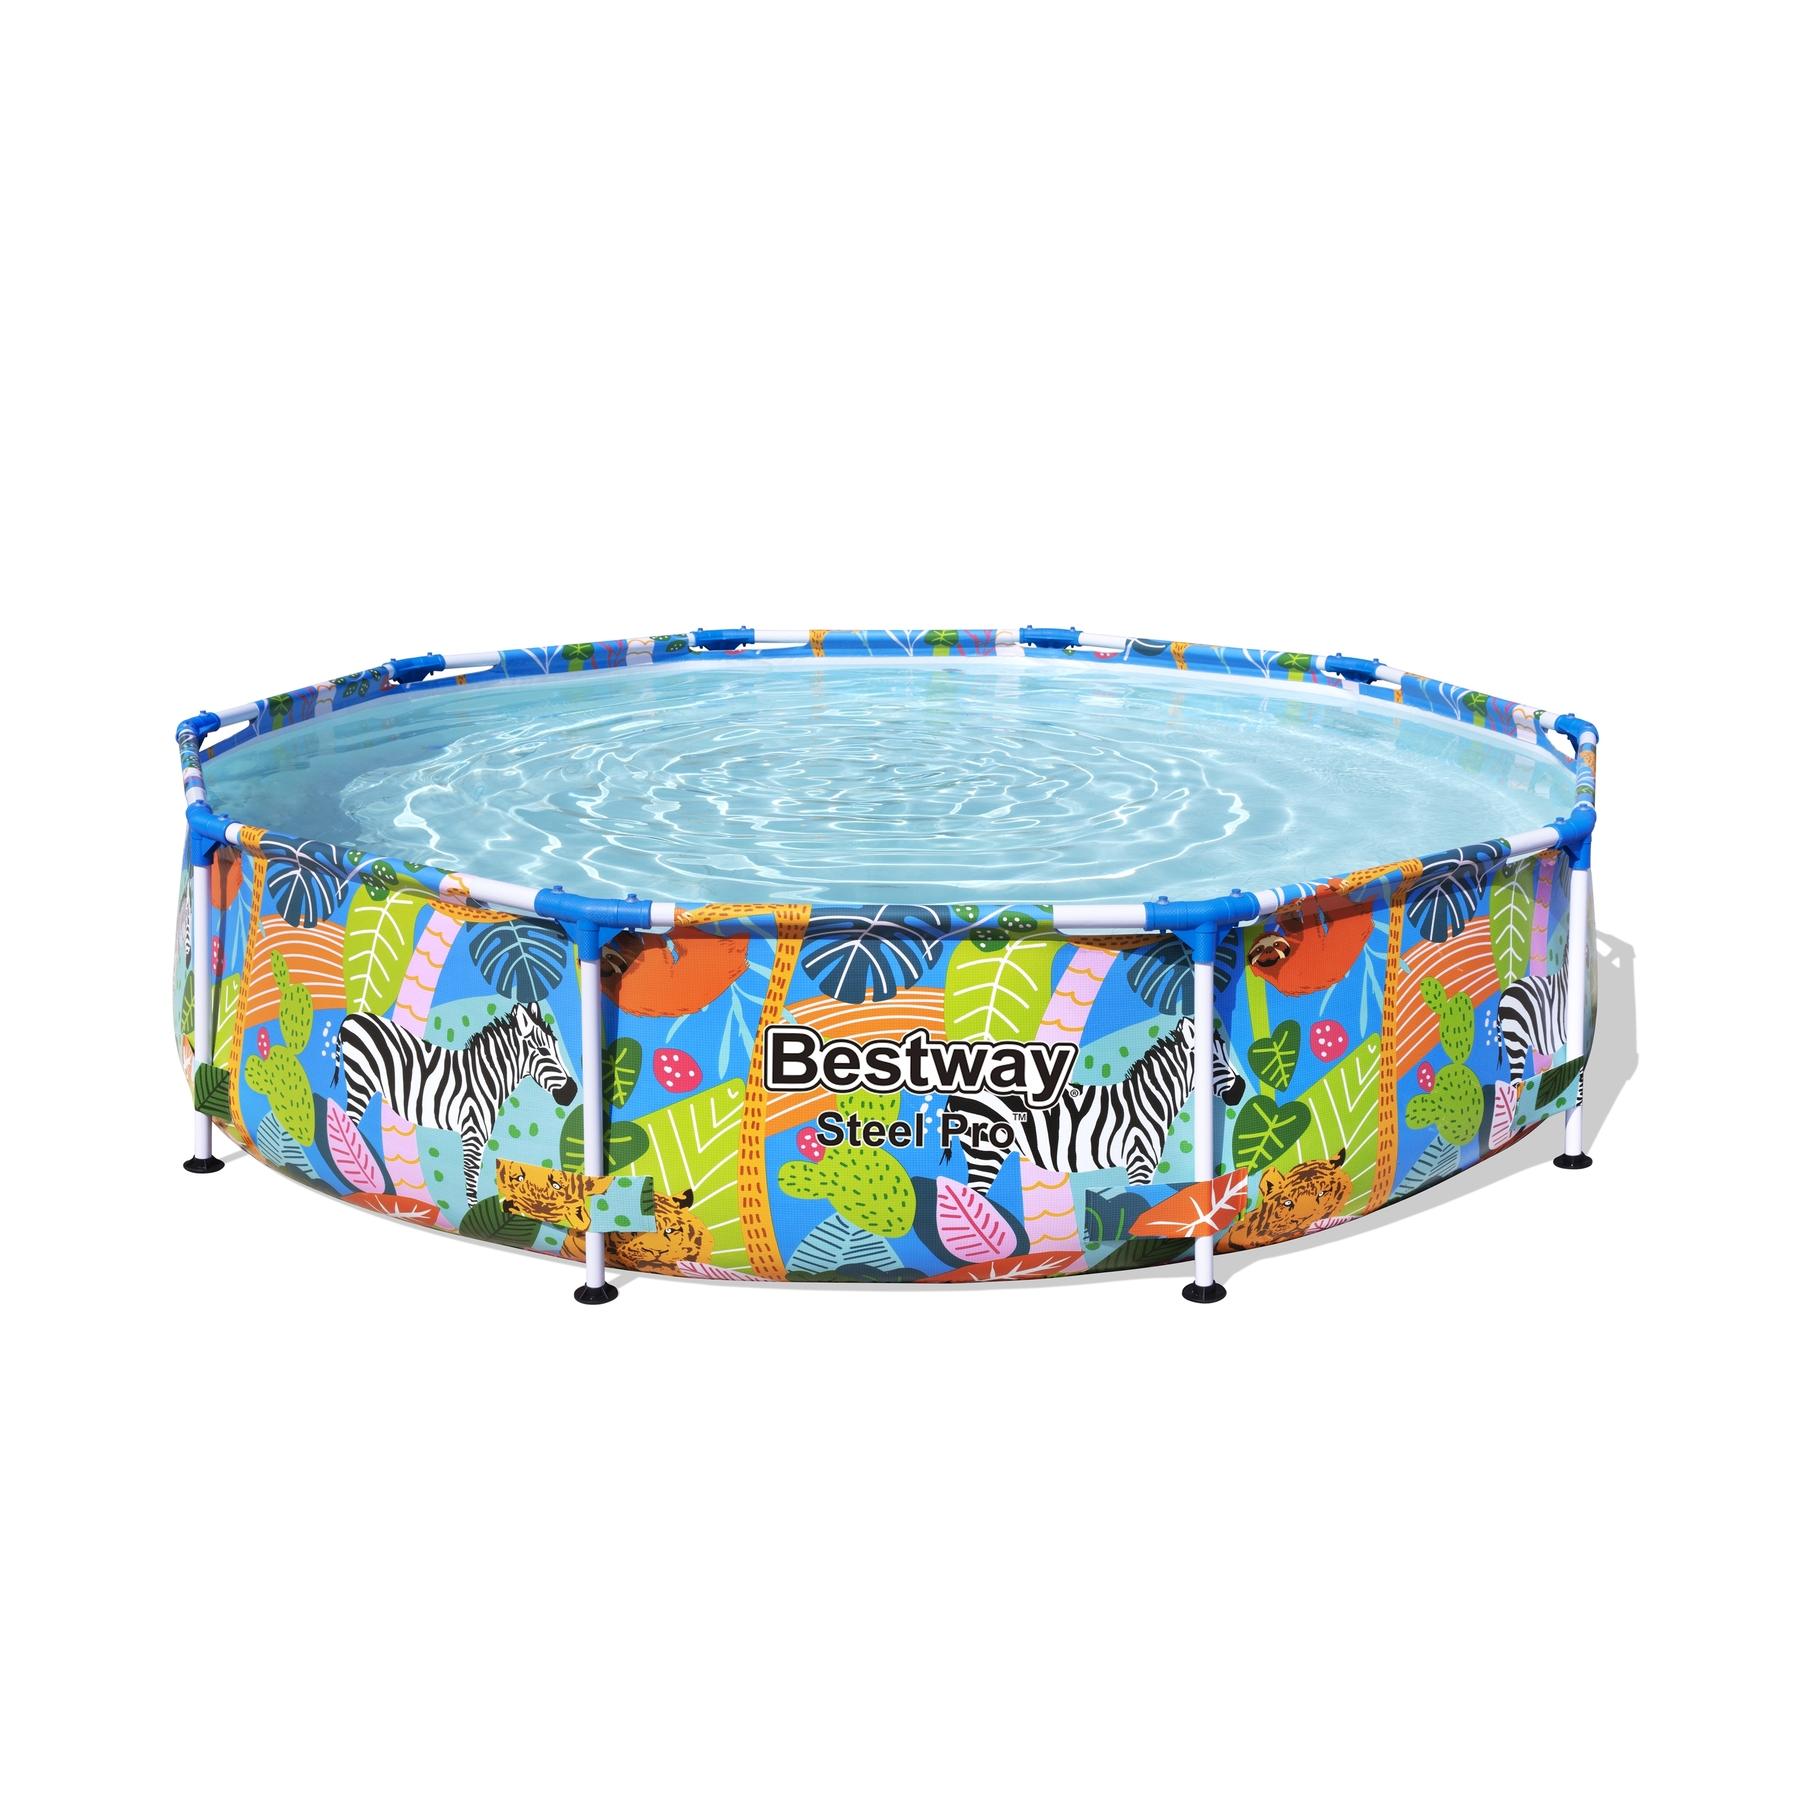 Scaffold Round Basin Multicolour, Size 305 х66см, Bestway, Pool For Garden, Summer, Leisure, Outdoor, Bright, Item No. 56985